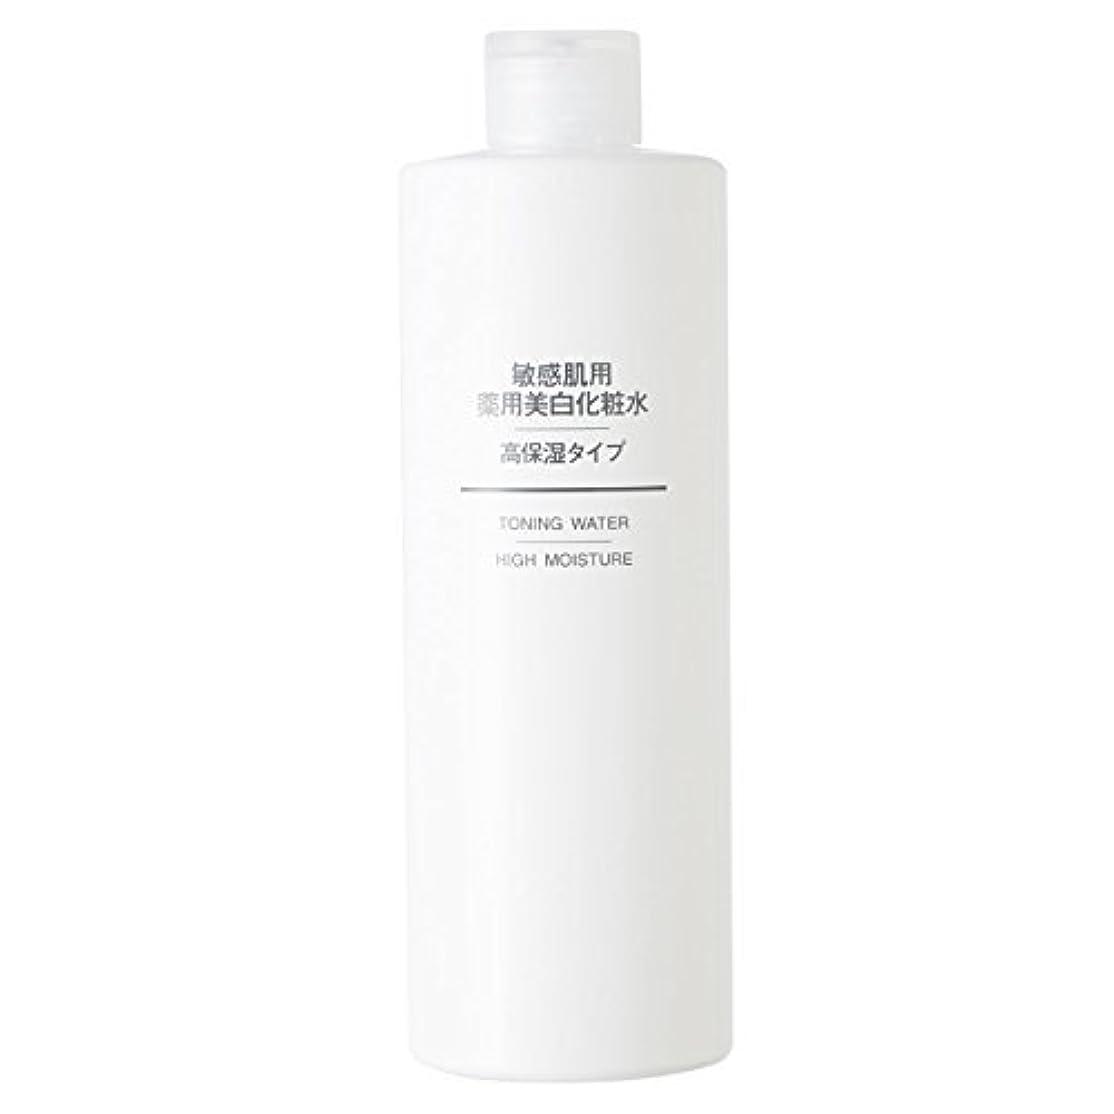 飼料ボーナス行商人無印良品 敏感肌用薬用美白化粧水?高保湿タイプ(大容量) (新)400ml